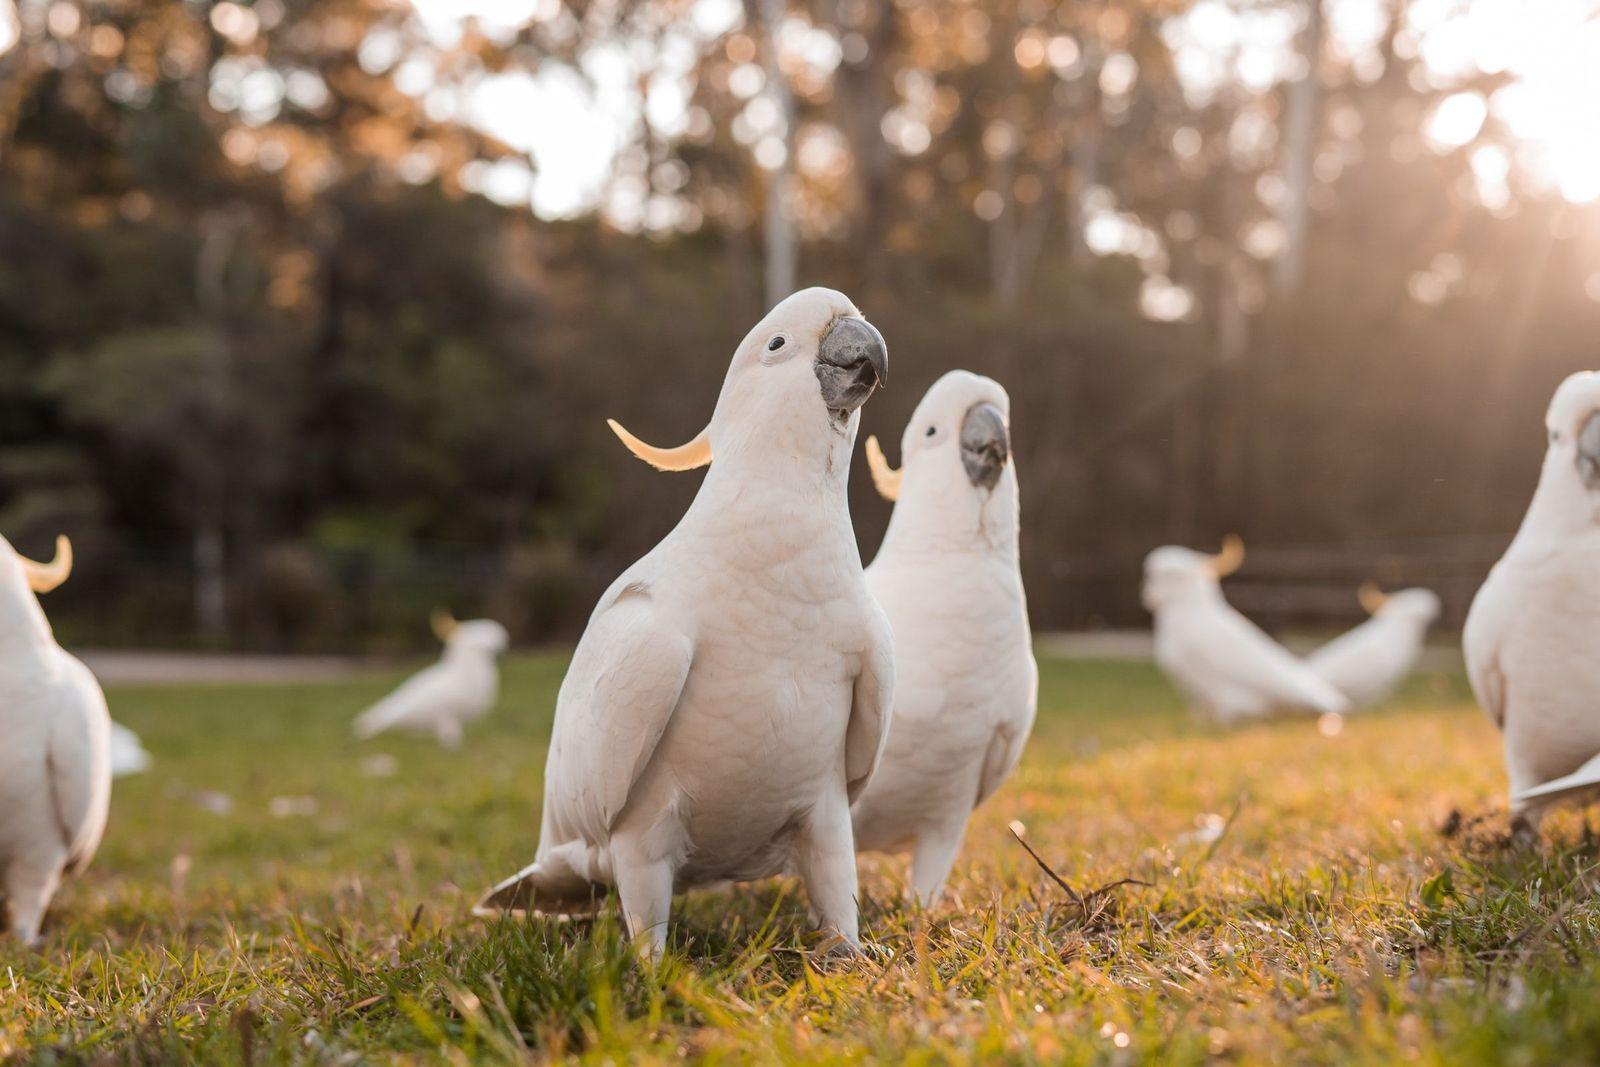 Feather plucking in birds - Vetster